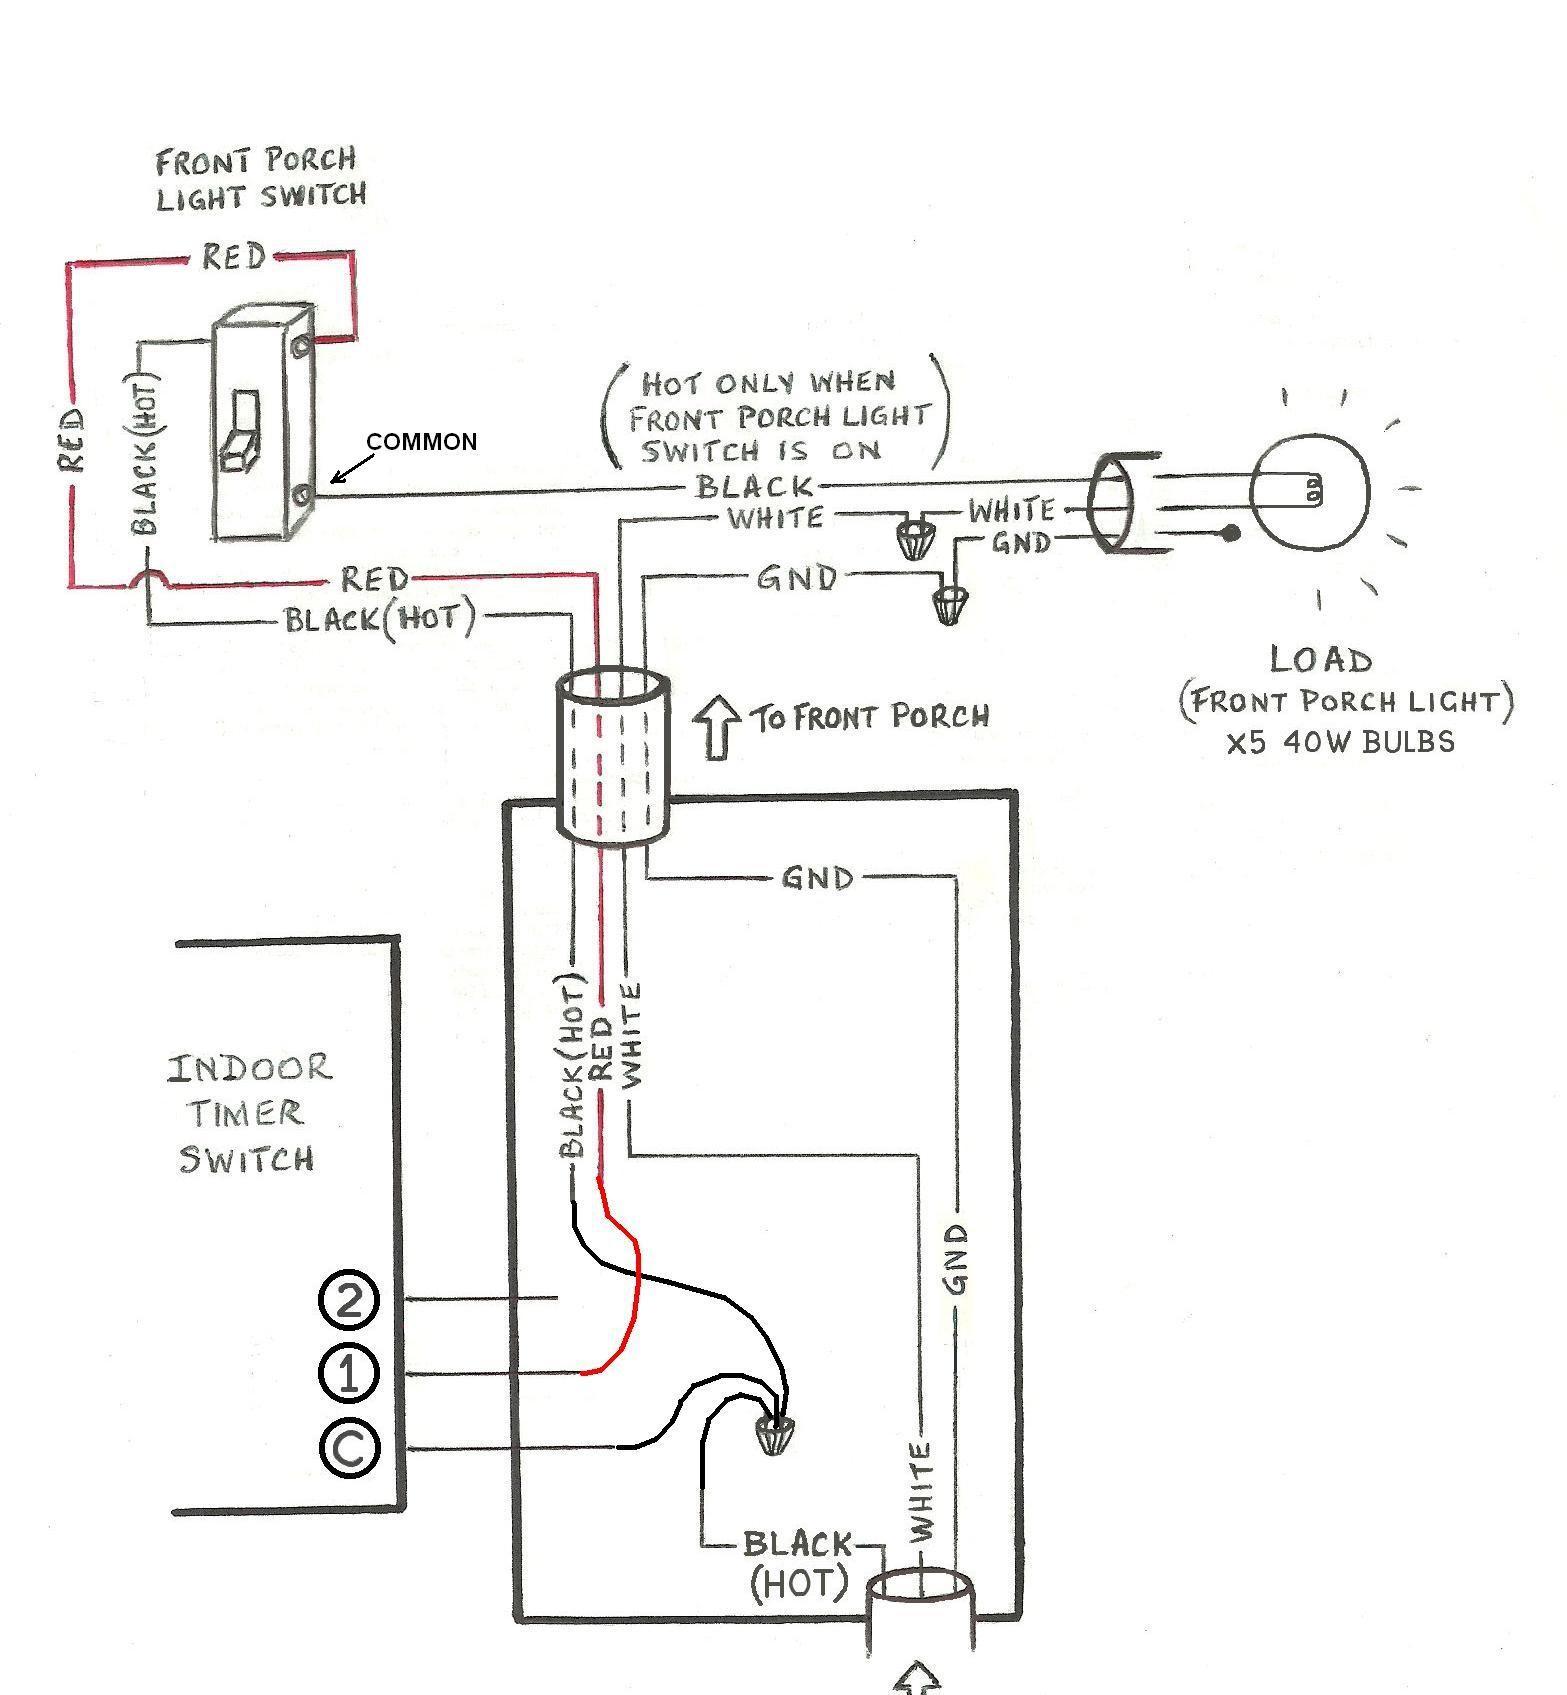 led wiring diagram 120v 73 dodge dart lighted rocker switch collection